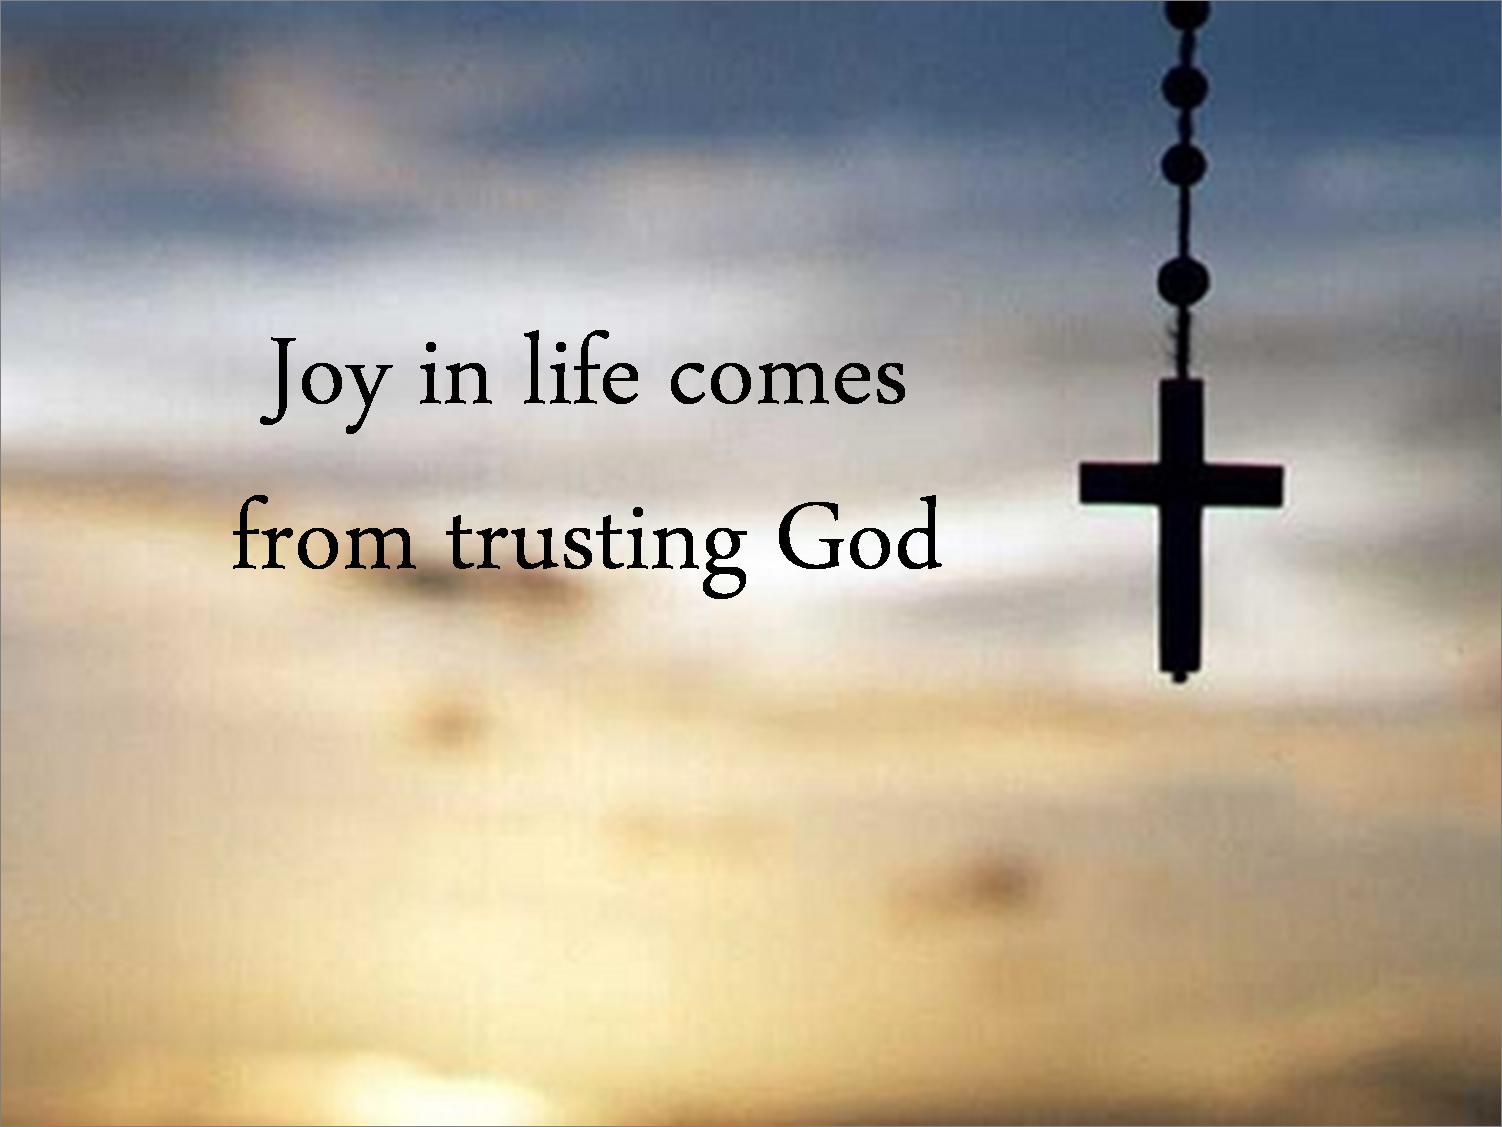 joy-in-life